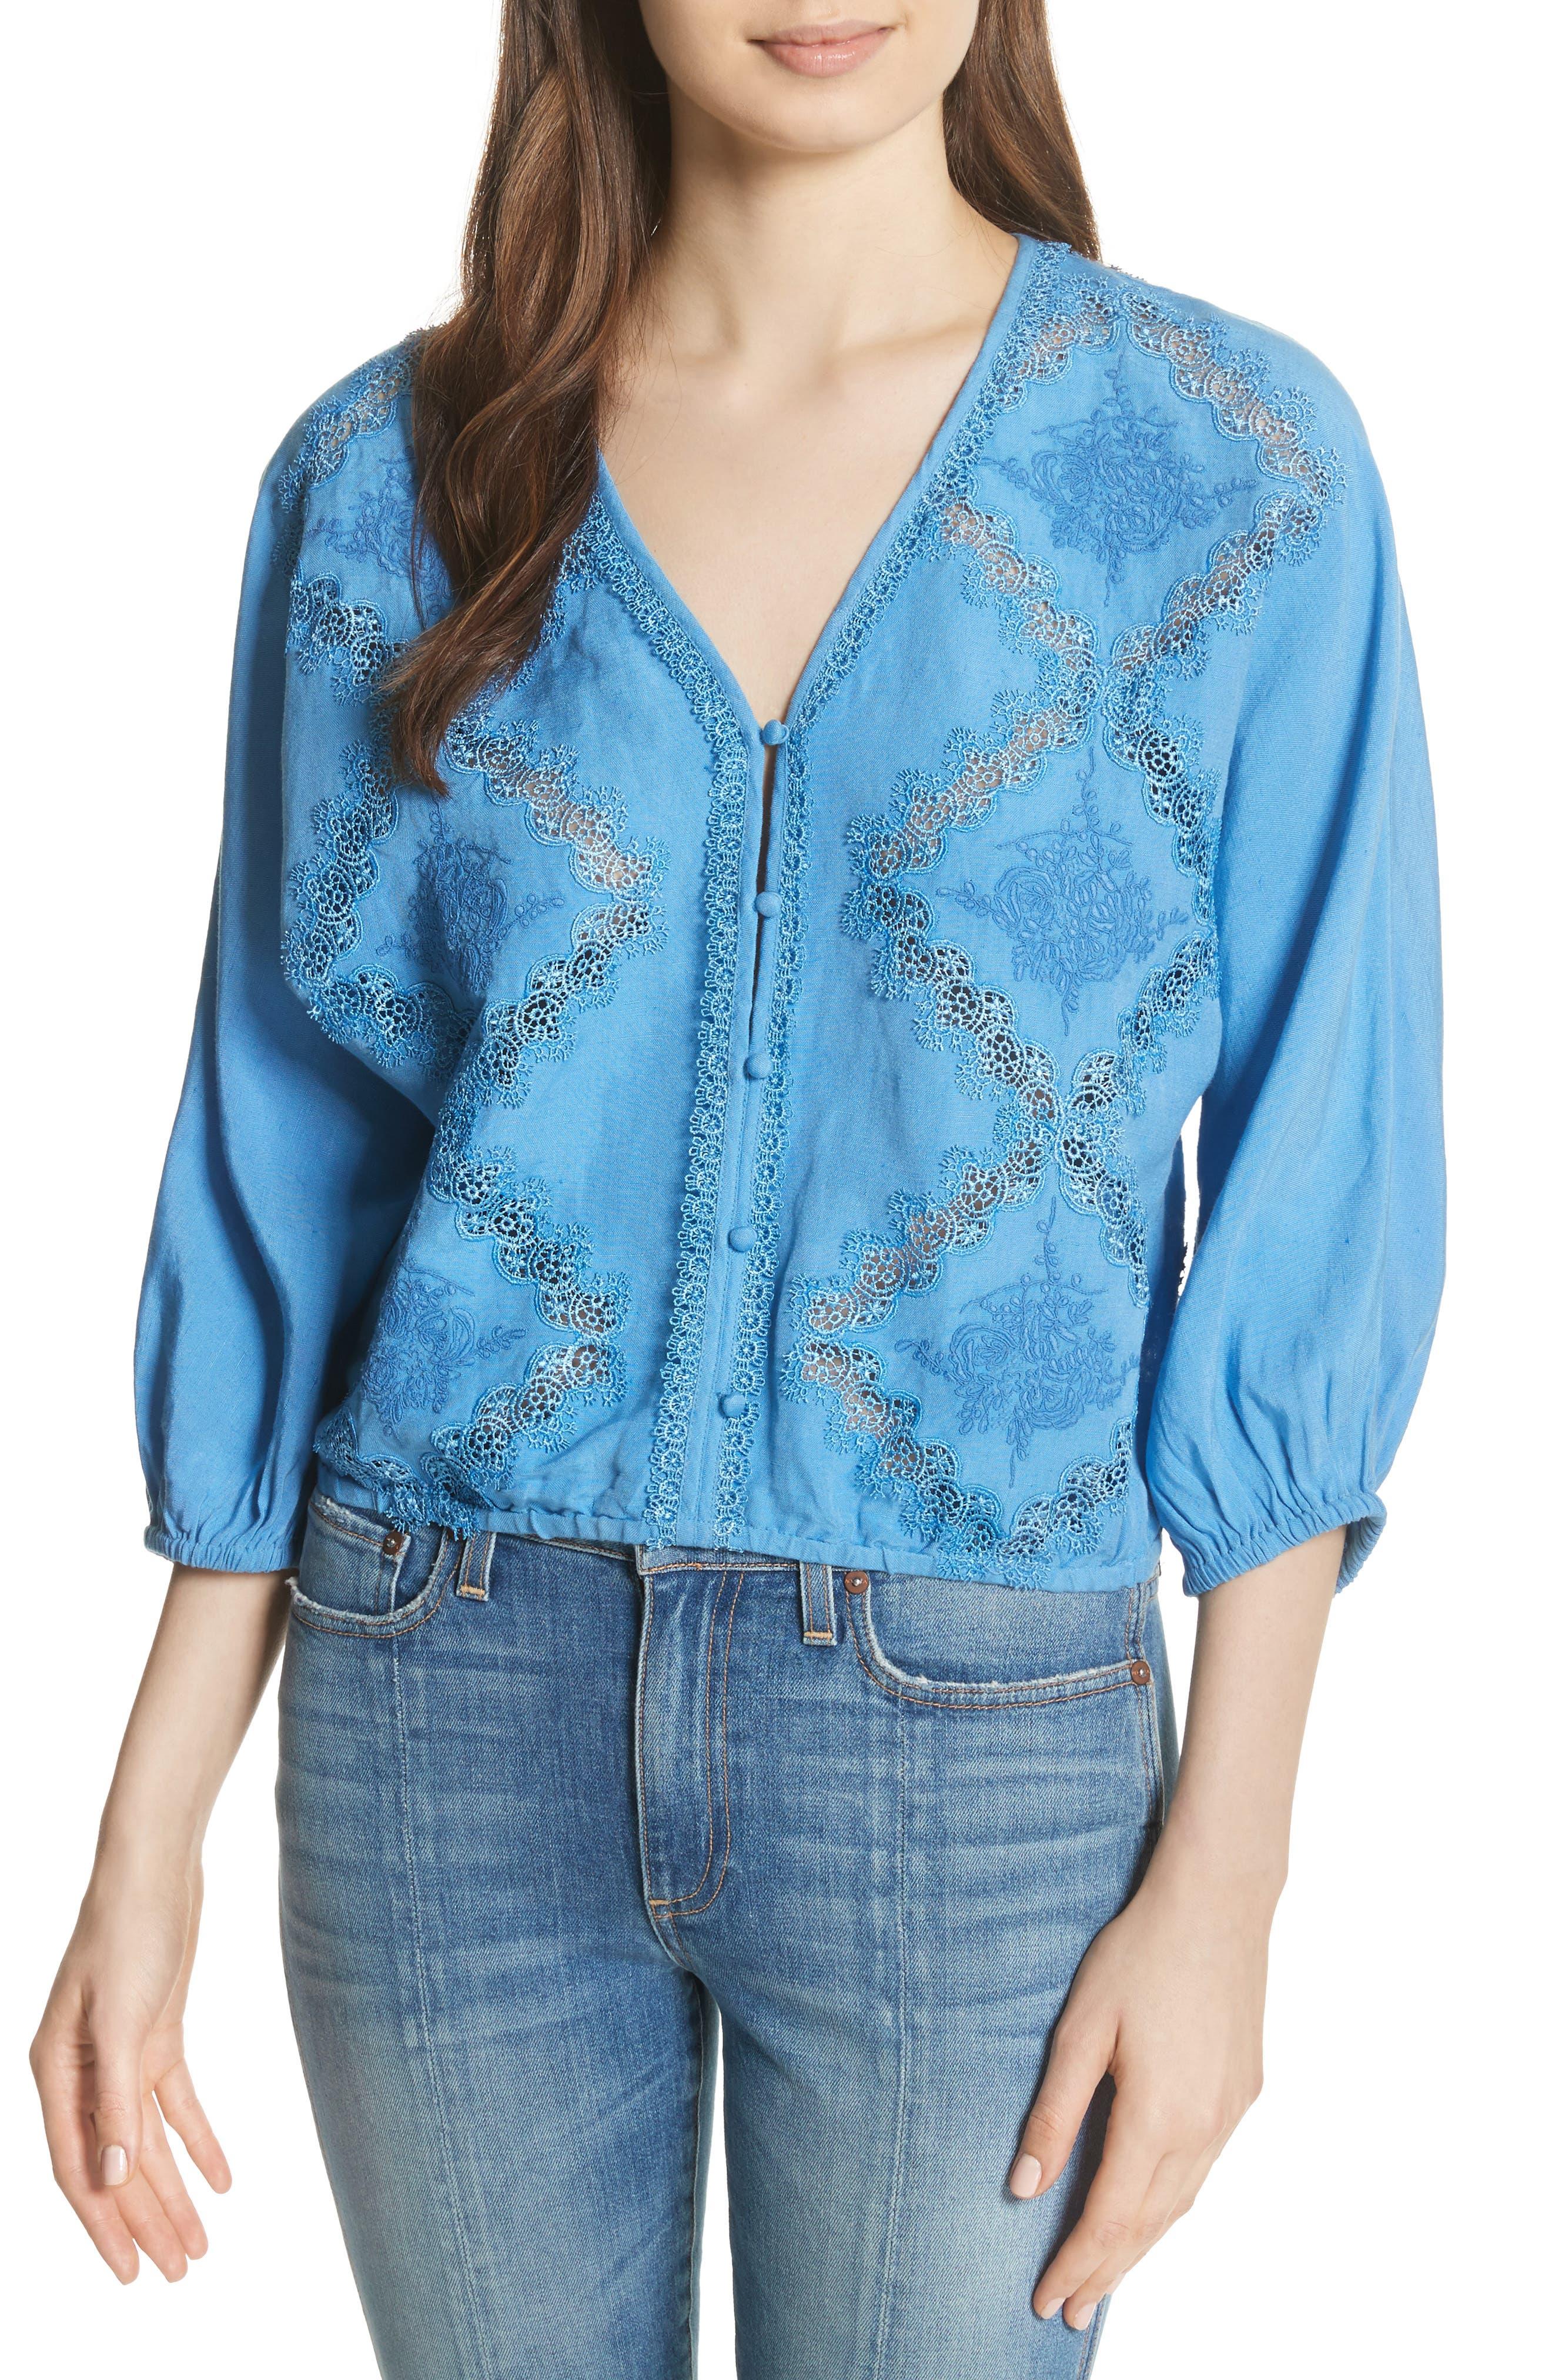 Main Image - Alice + Olivia Hilma Embroidered Blouson Sleeve Blouse